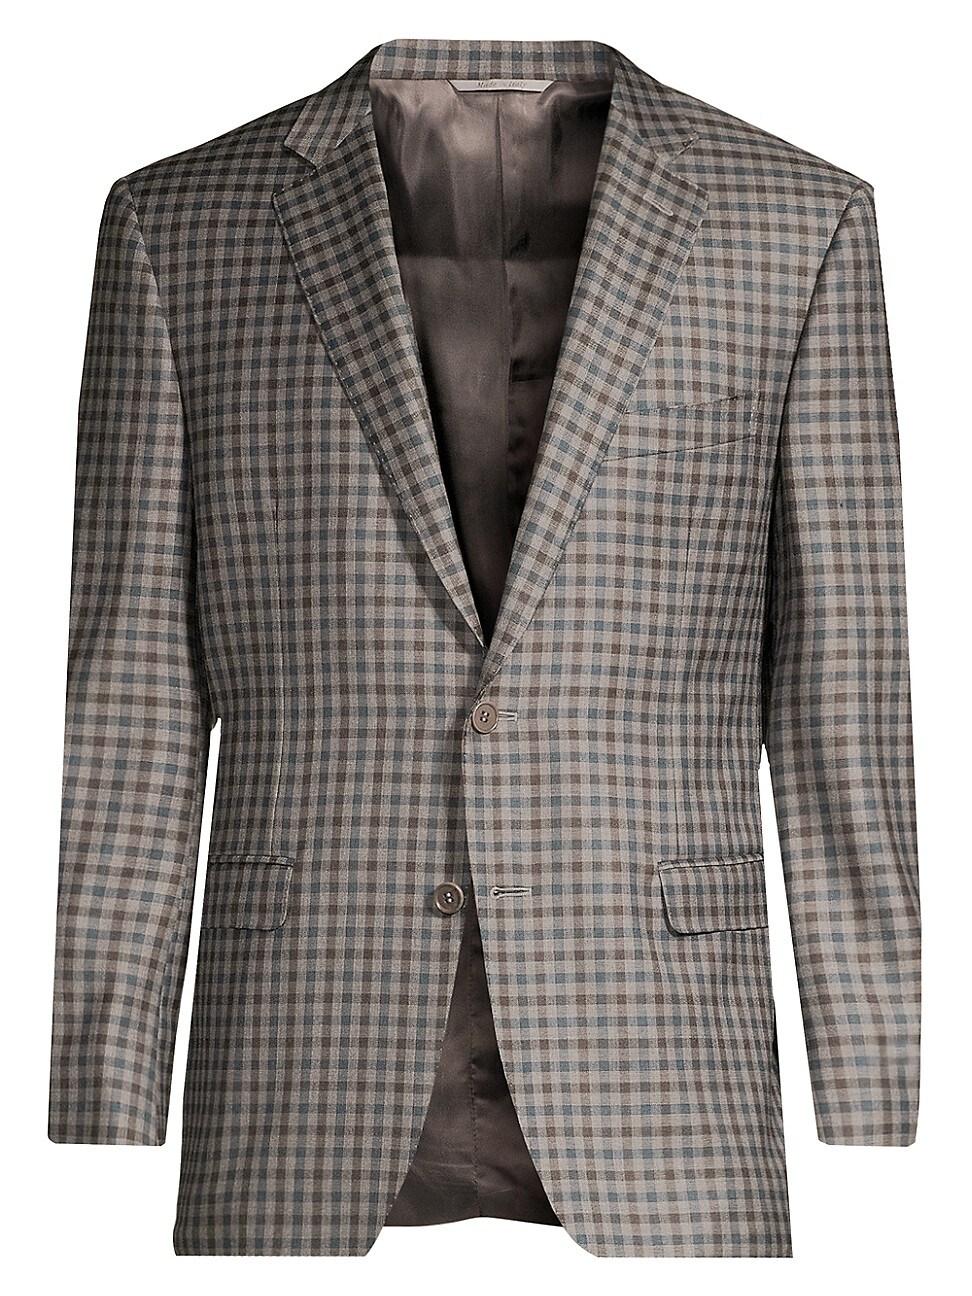 Canali Men's Plaid Wool Jacket In Grey